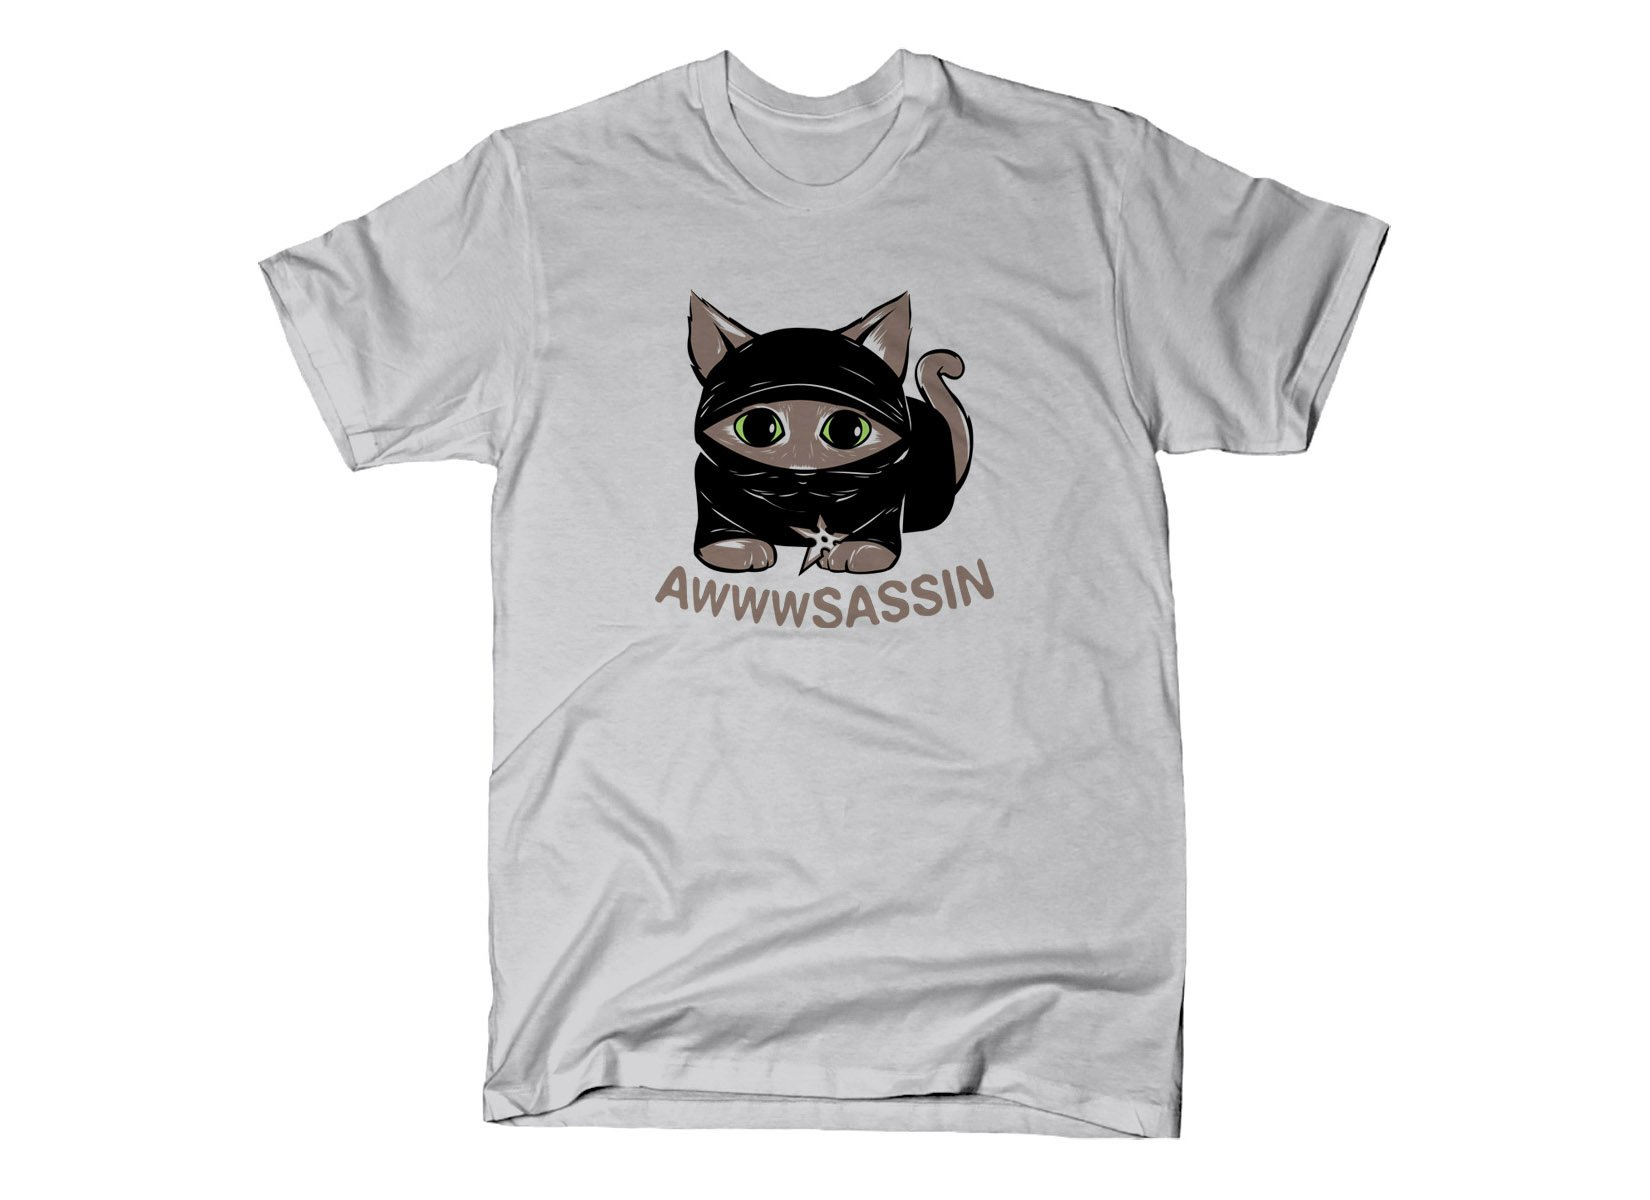 Awwwsassin on Mens T-Shirt